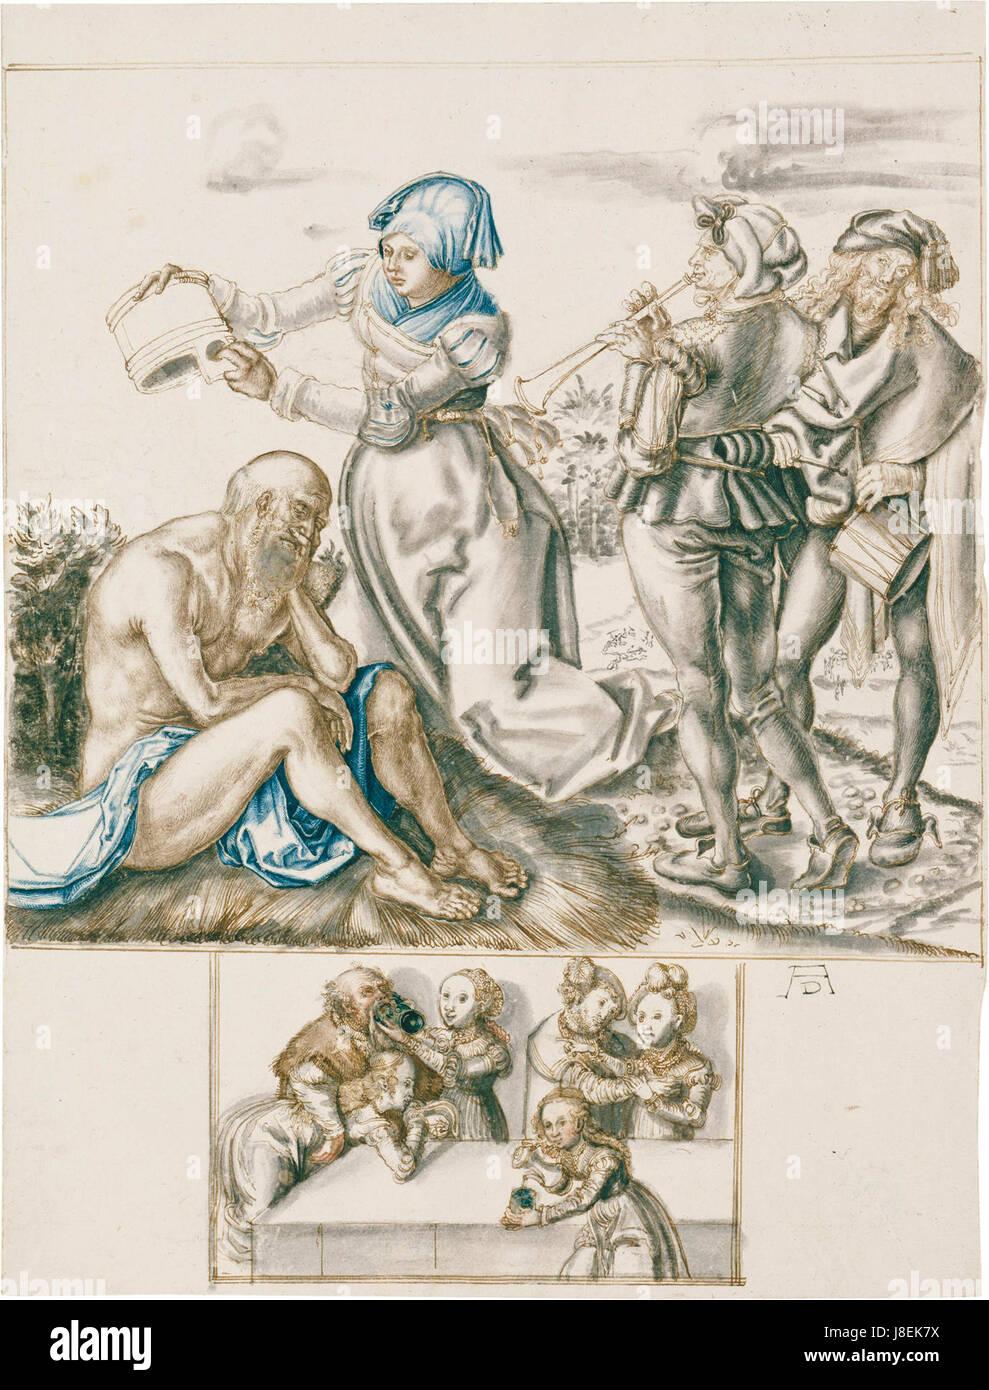 Lucas Cranach Hiob with false signature AD - Stock Image